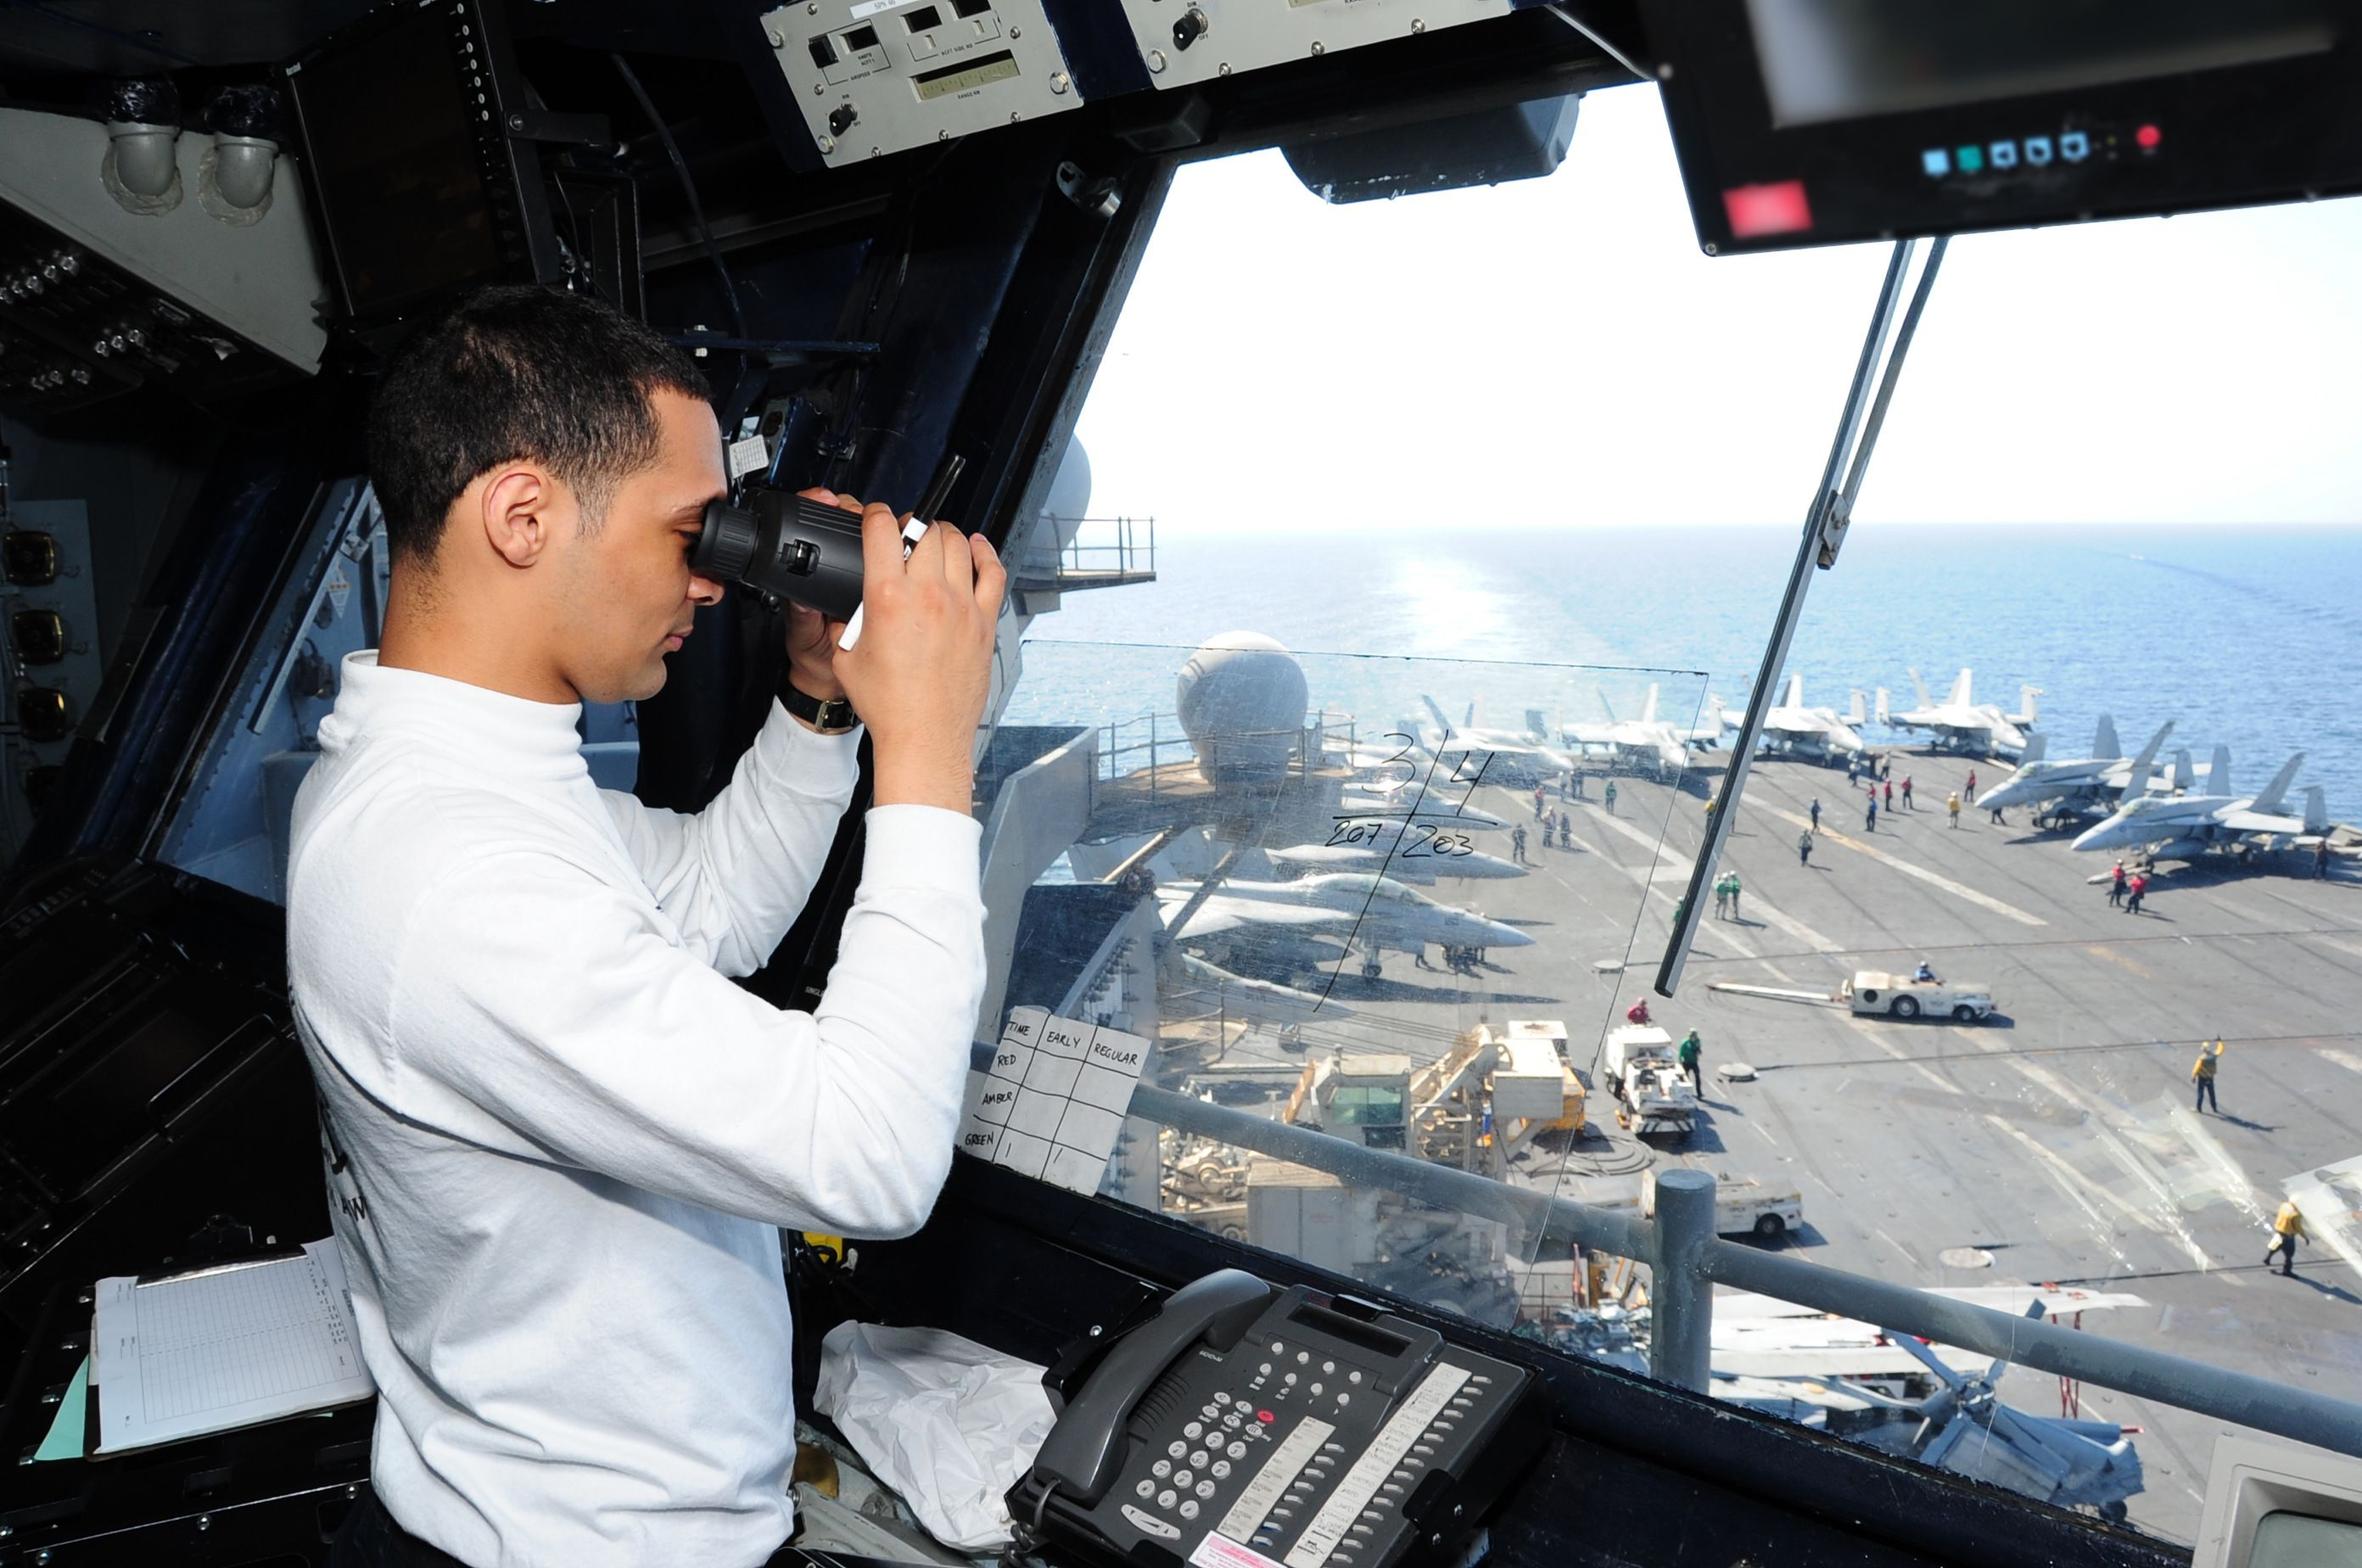 141010 N Cz979 003 Aviation Boatswain S Mate 3rd Class Matthew Reyes Observes Flight Operations From Primary Flight Contr Aircraft Carrier Flight Deck Aviation